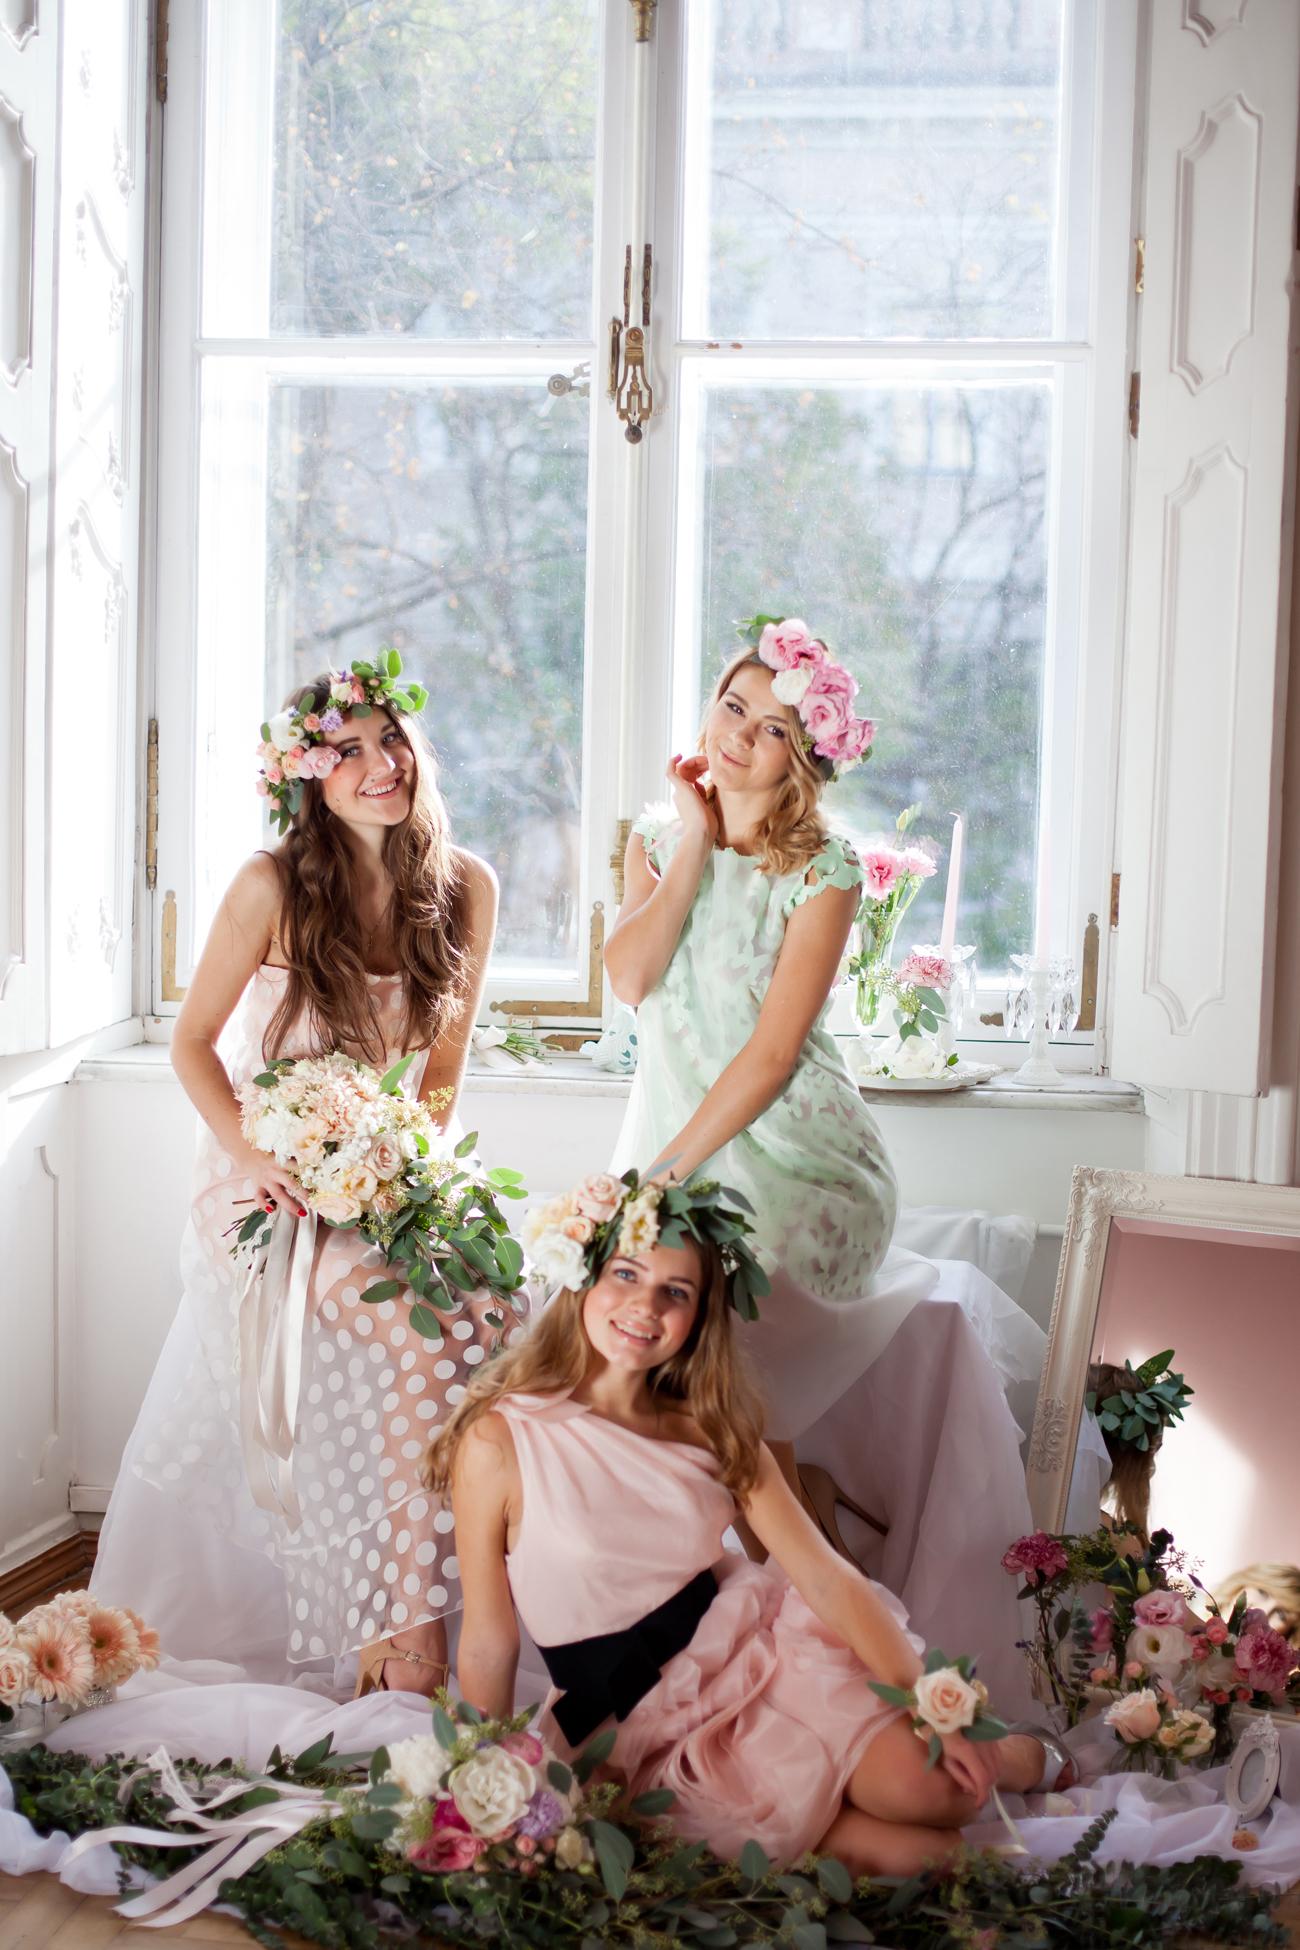 Floral November: стилизованная съемка